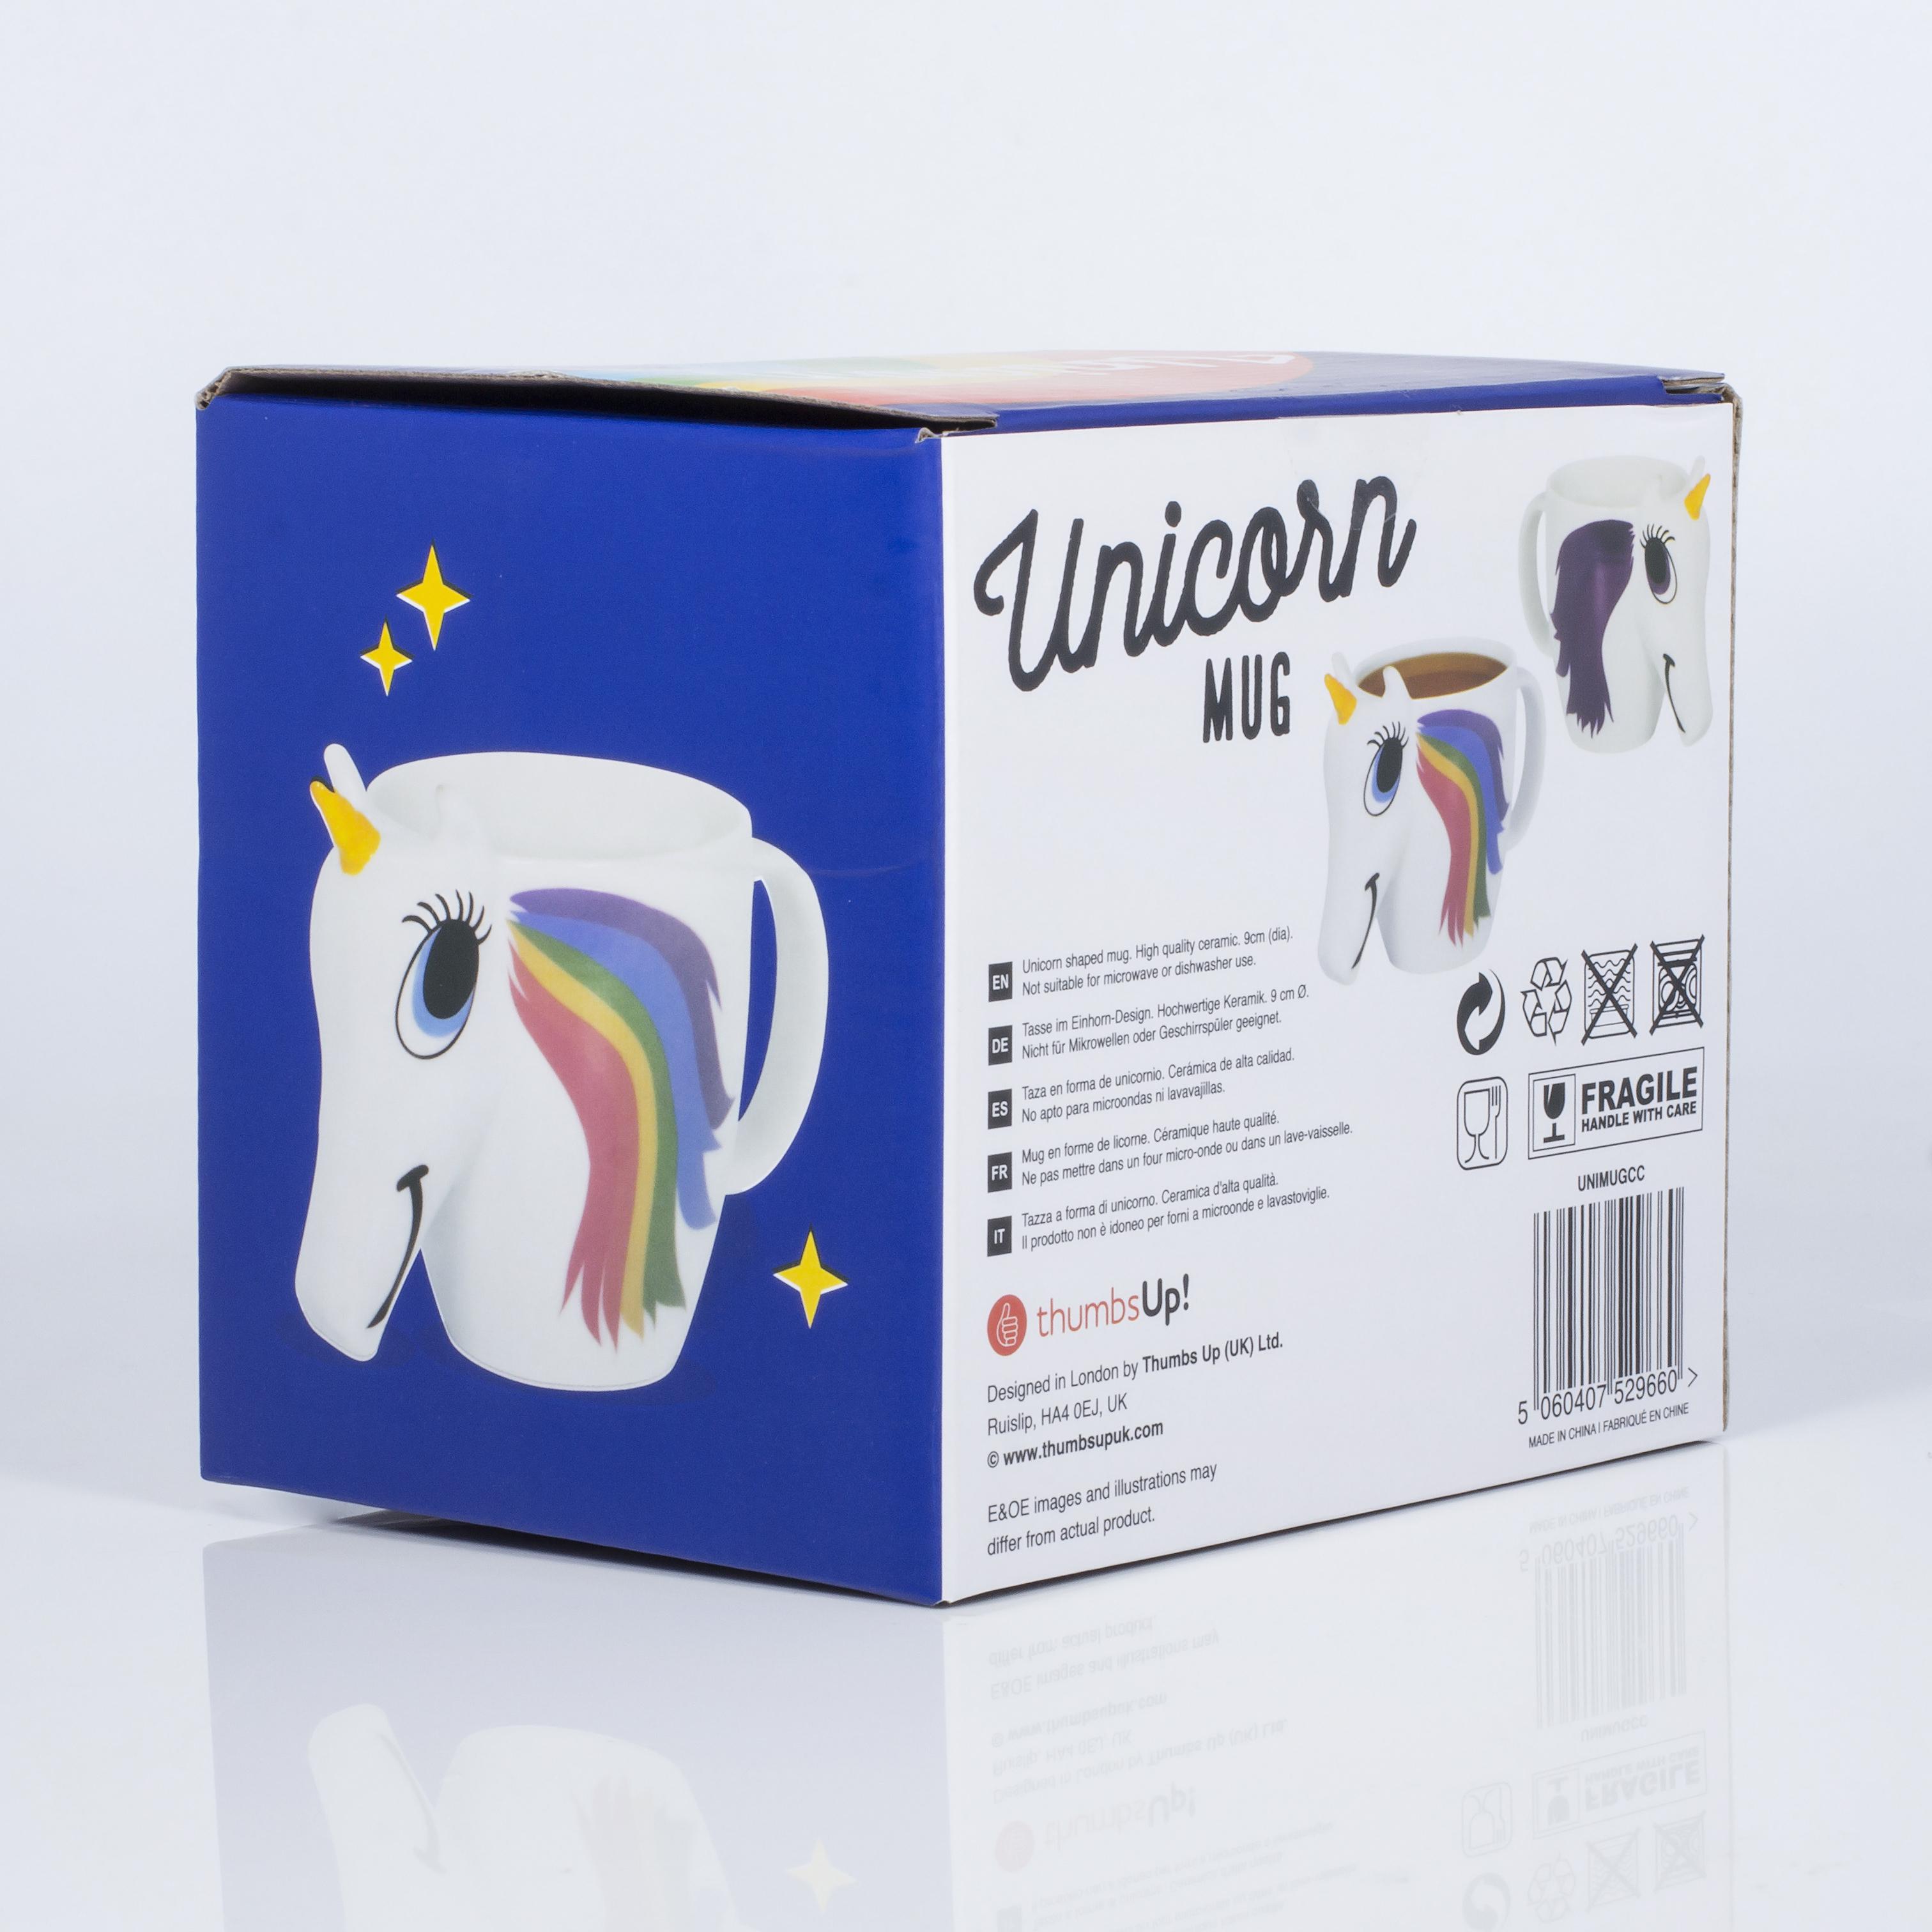 Thumbs Up UNIMUGCC - Eins/Eine(r) - 0,3 l - Mehrfarbig - Keramik - Universal - 1 Stück(e)